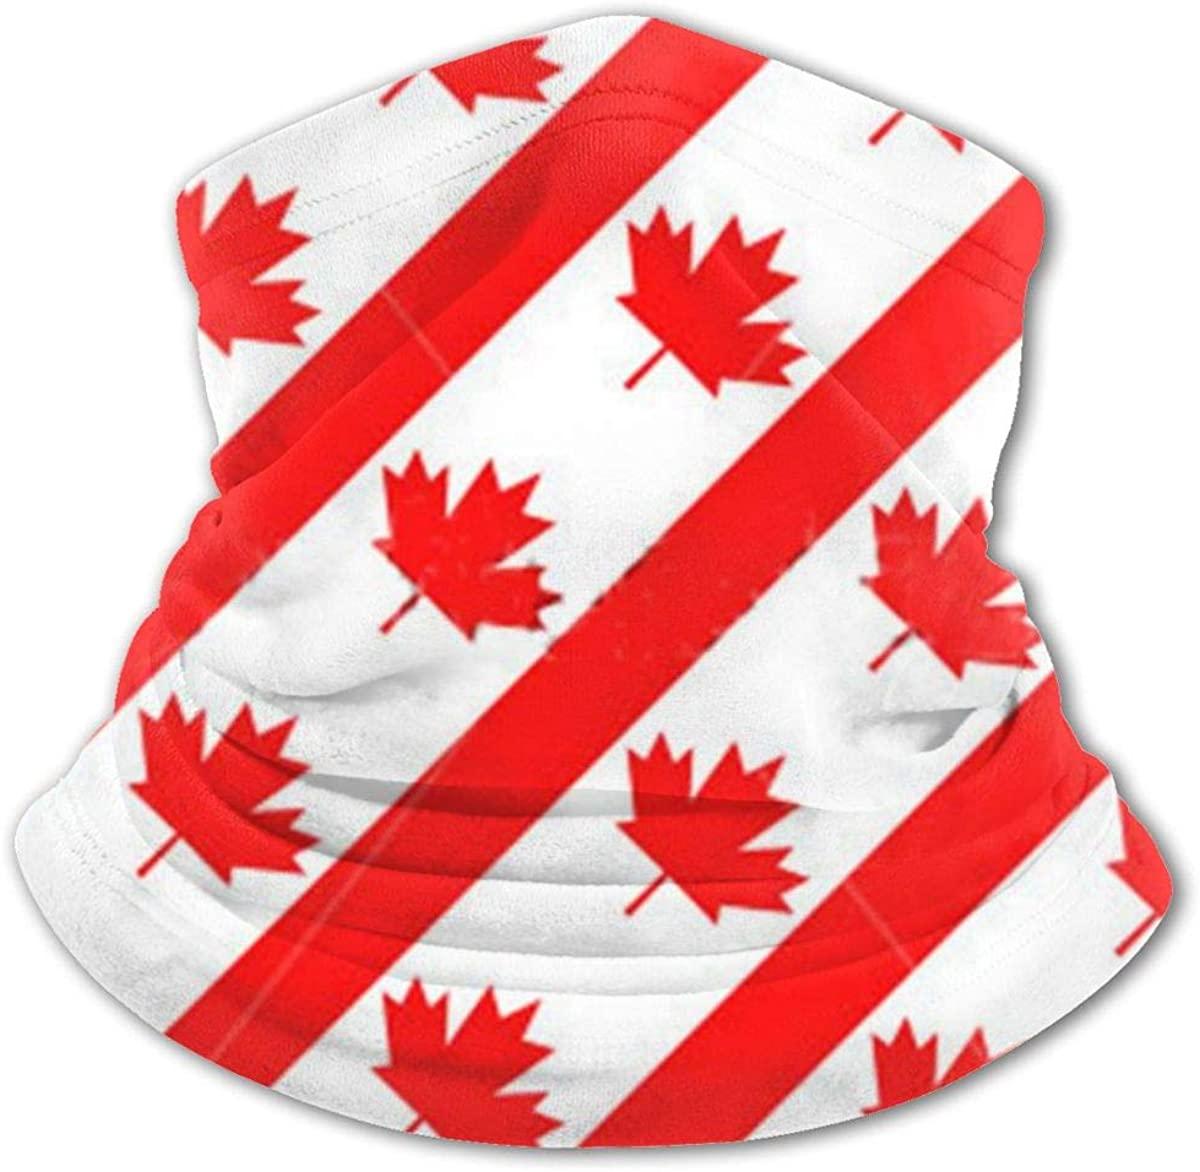 Canadian Symbol Maple Leaf Flag Headwear For Girls And Boys, Head Wrap, Neck Gaiter, Headband, Tenn Fishing Mask, Magic Scarf, Tube Mask, Face Bandana Mask For Camping Running Cycling